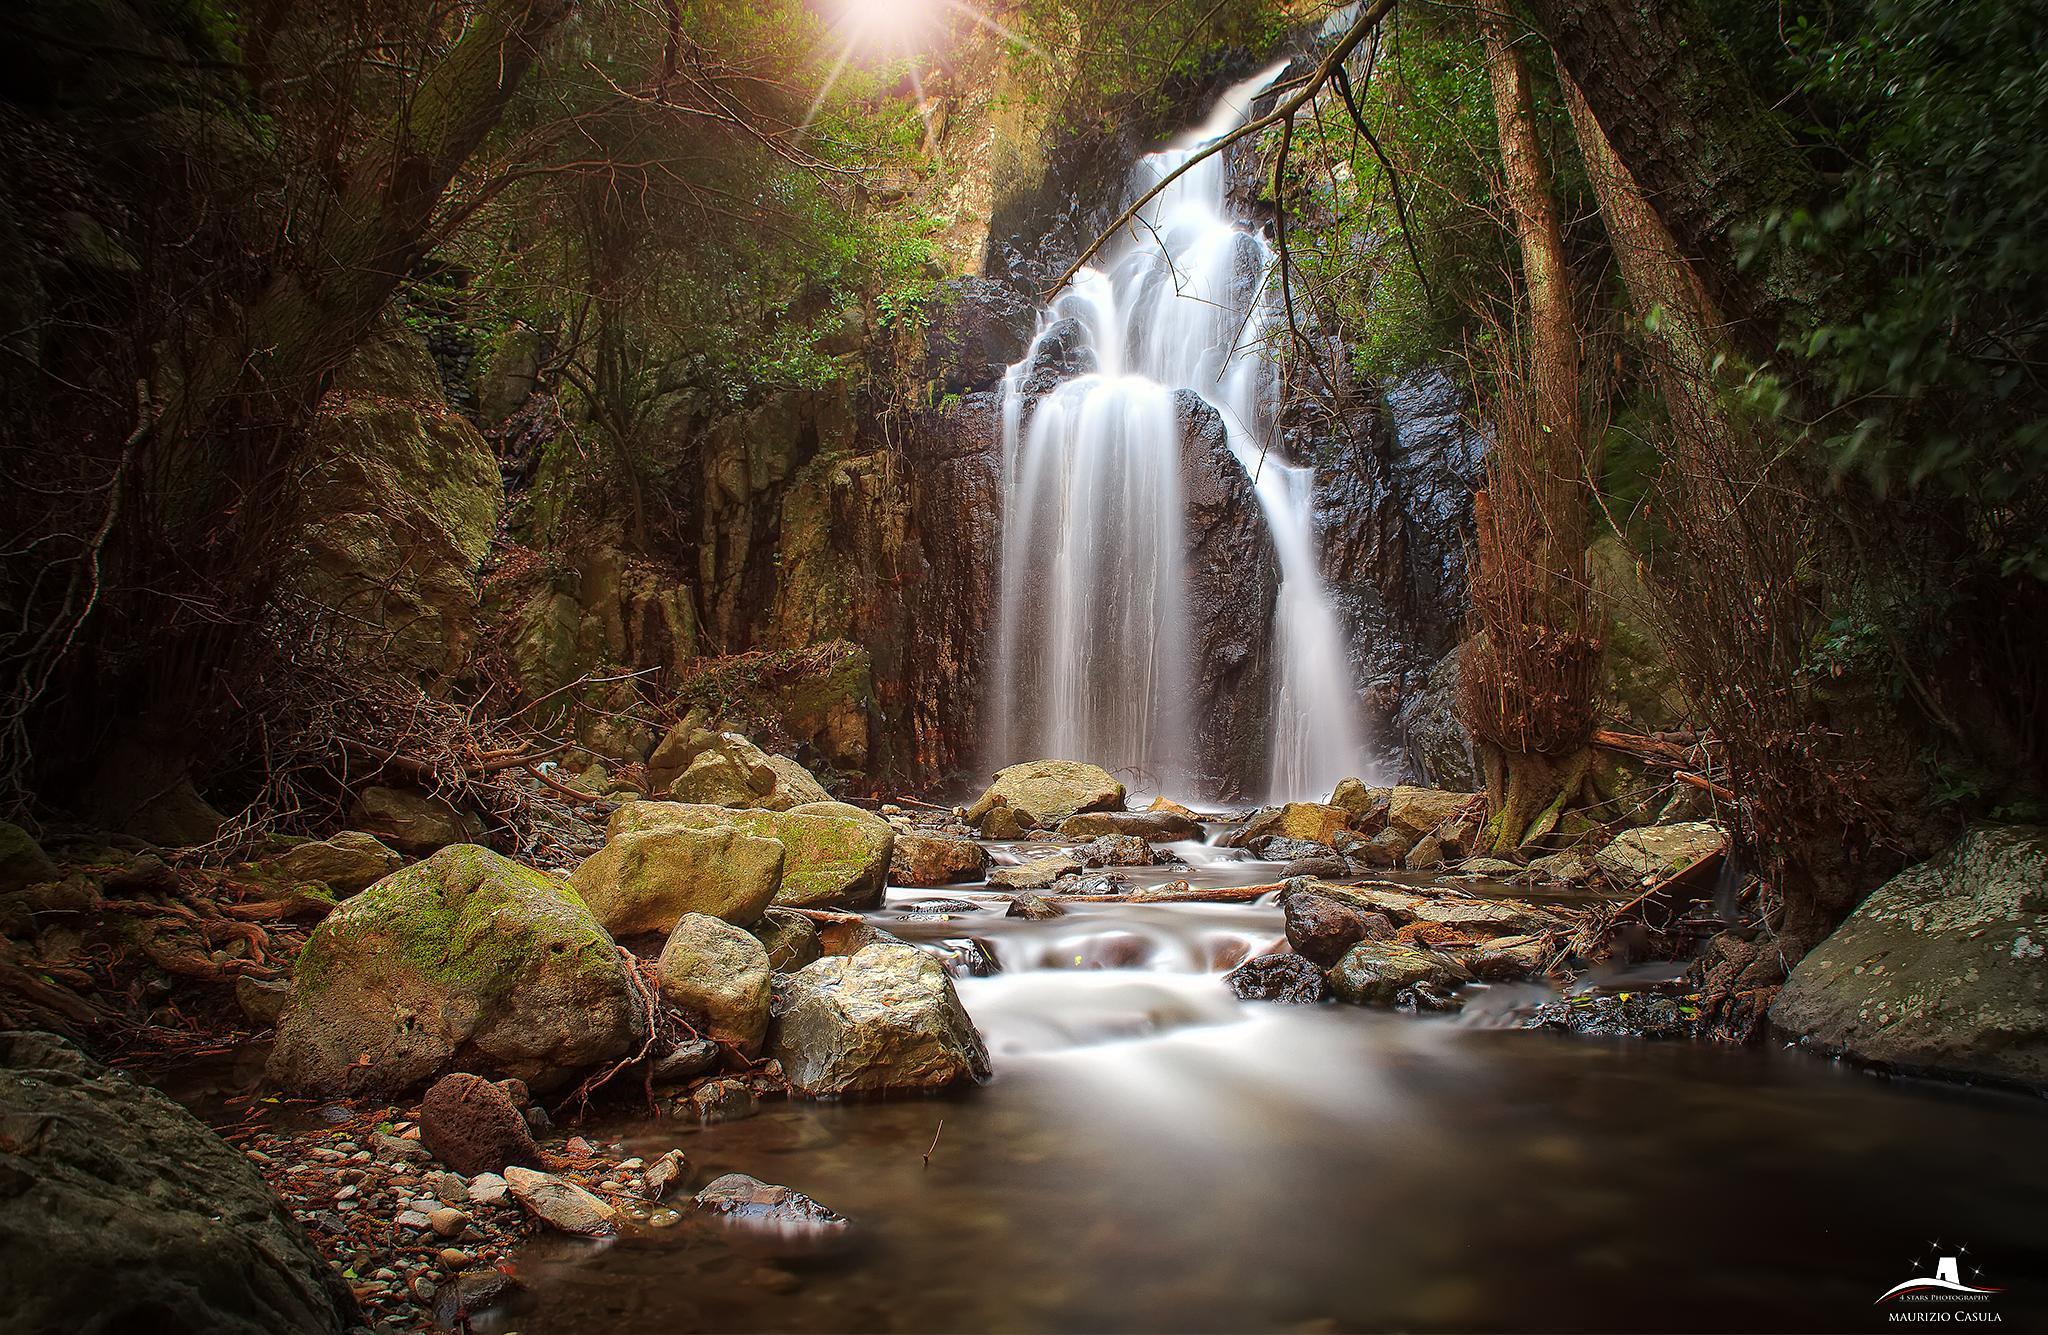 Waterfall made in Sardinia by Maurizio Casula